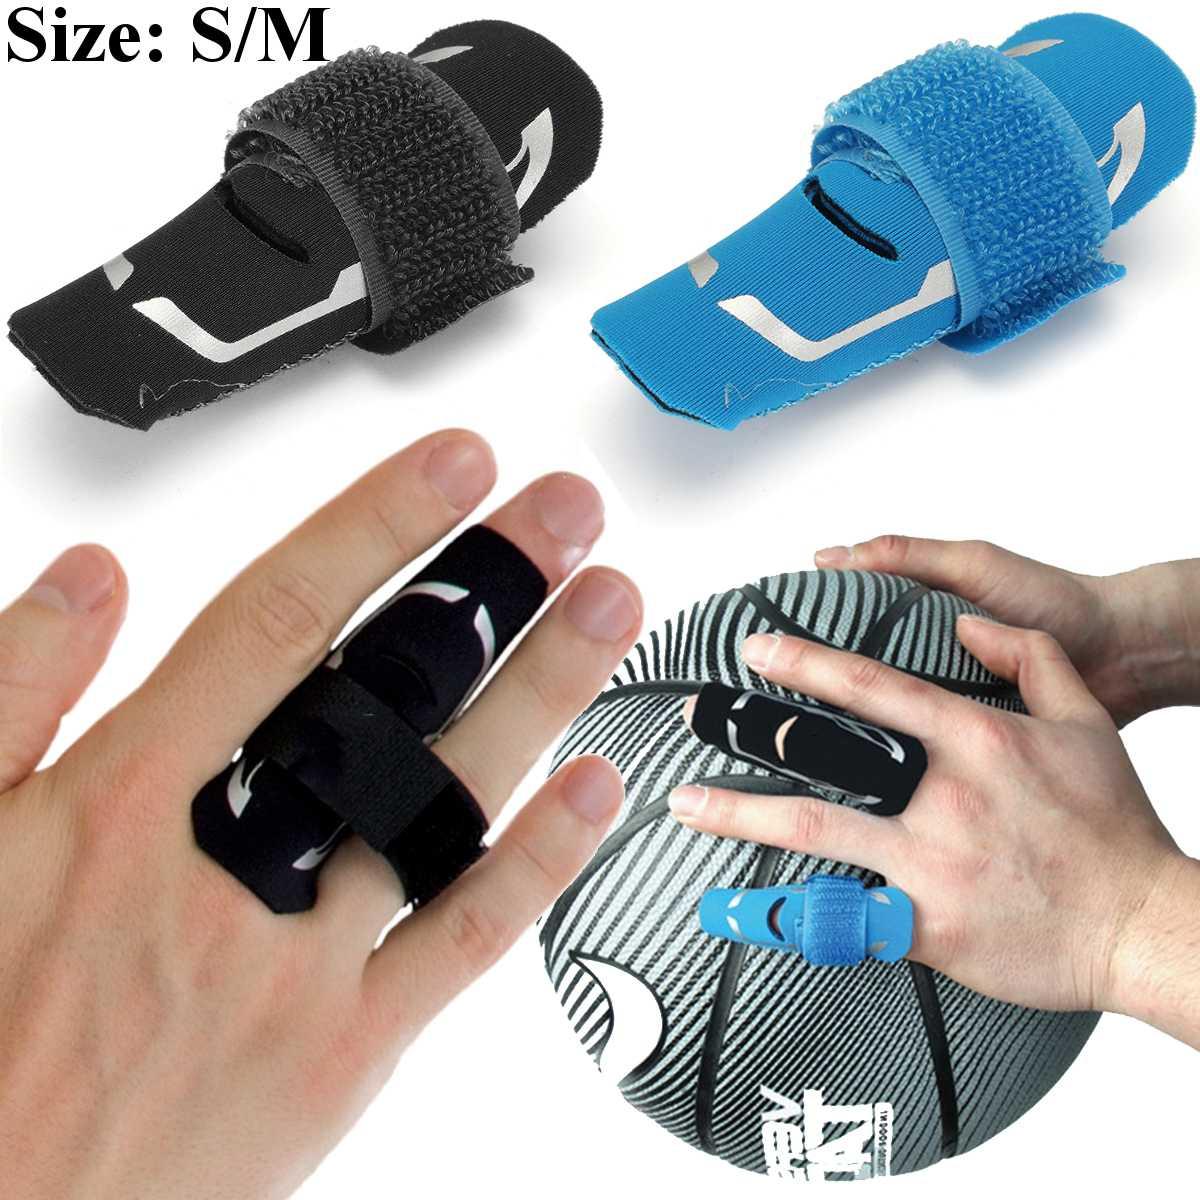 Dedo de Basquete Protetor de Dedo Novo Proteger Cinta Esporte Dedo Artrose Banda Splint Guarda Faixas